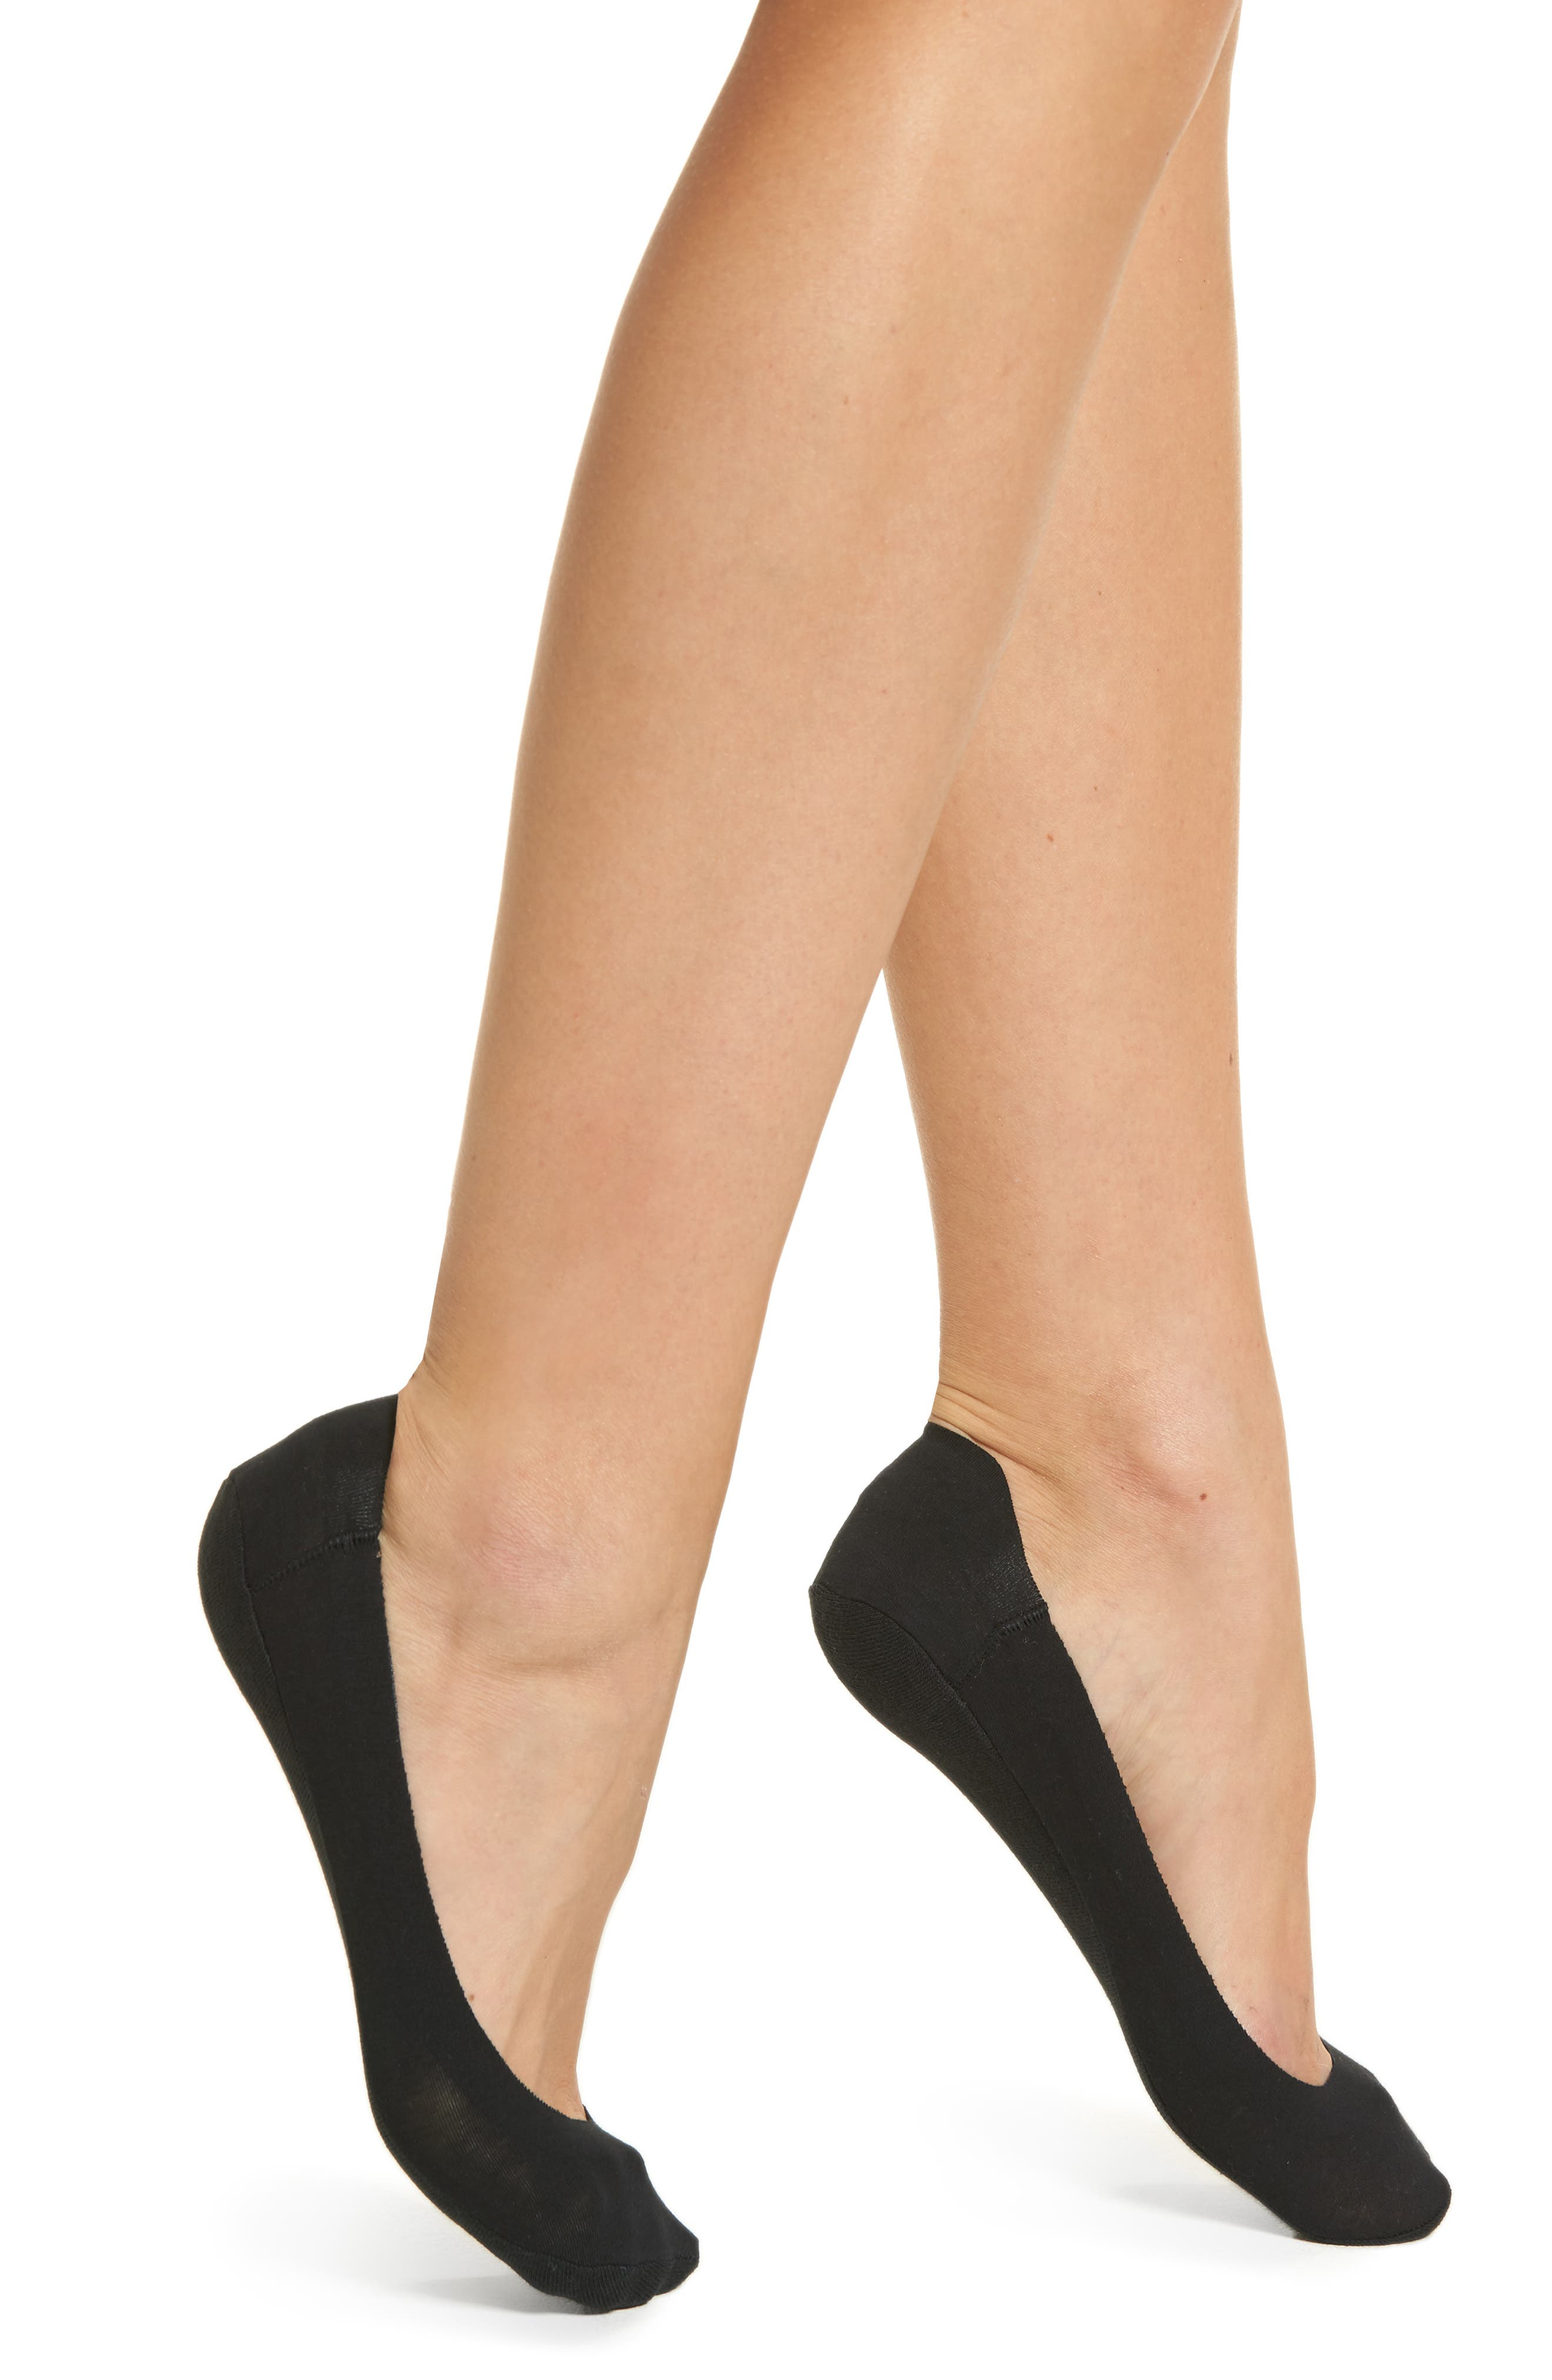 Main Image - Hue Perfect Edge No-Show Liner Socks (3 for $16)